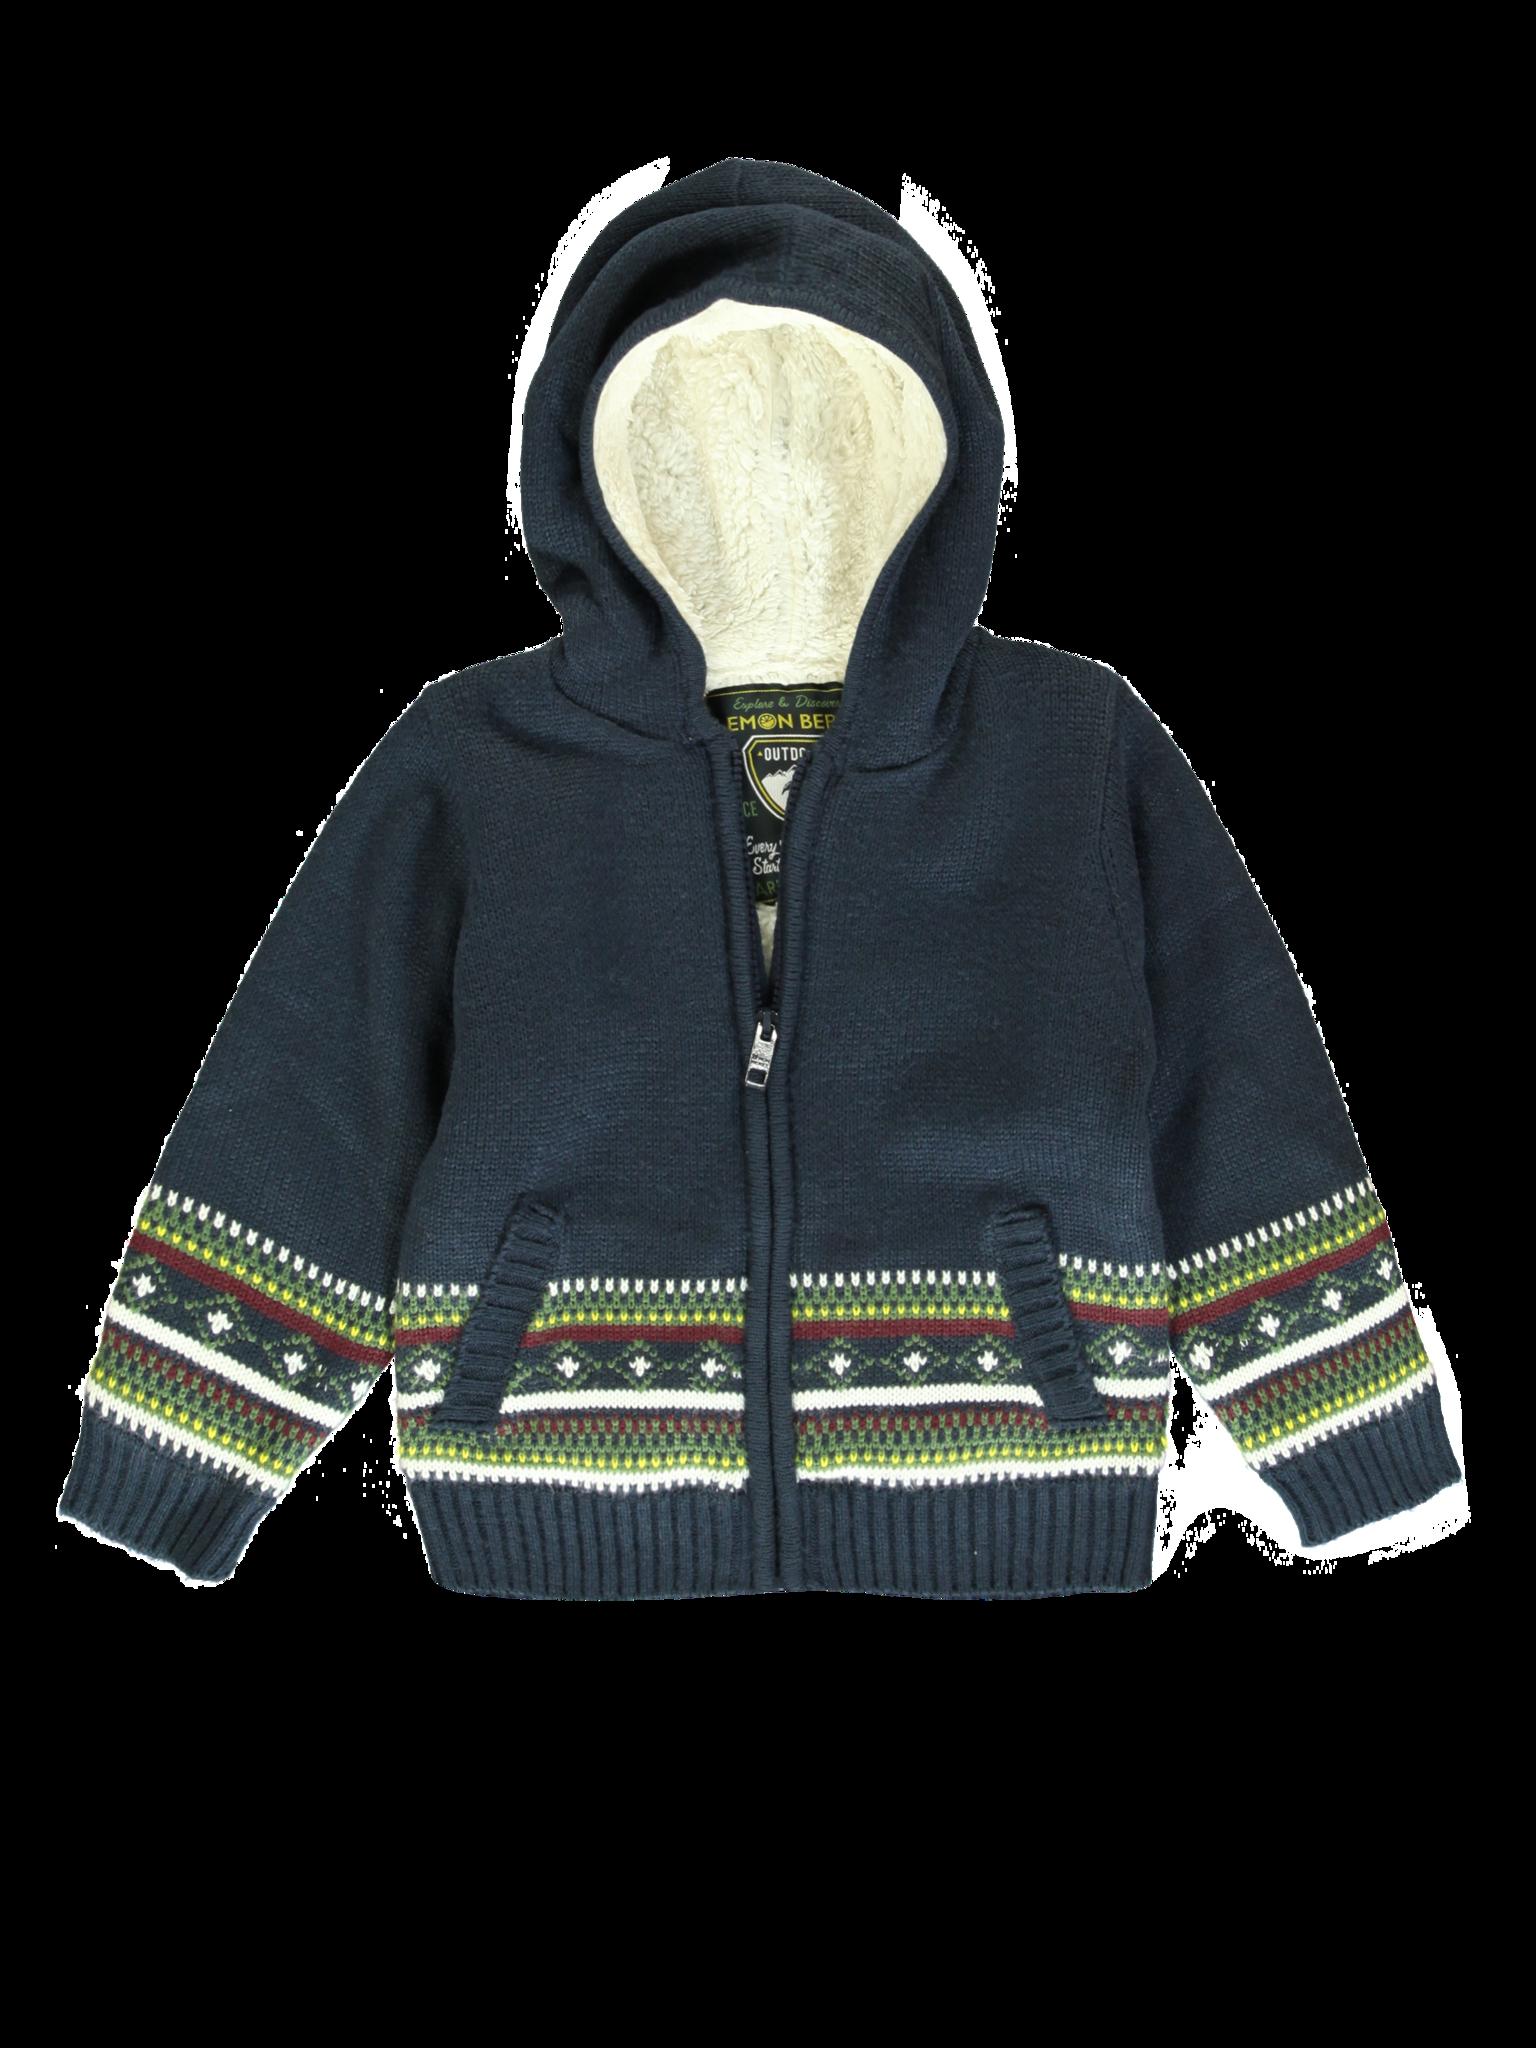 All Brands | Winterproducts Small Boys | Cardigan Knitwear | 12 pcs/box